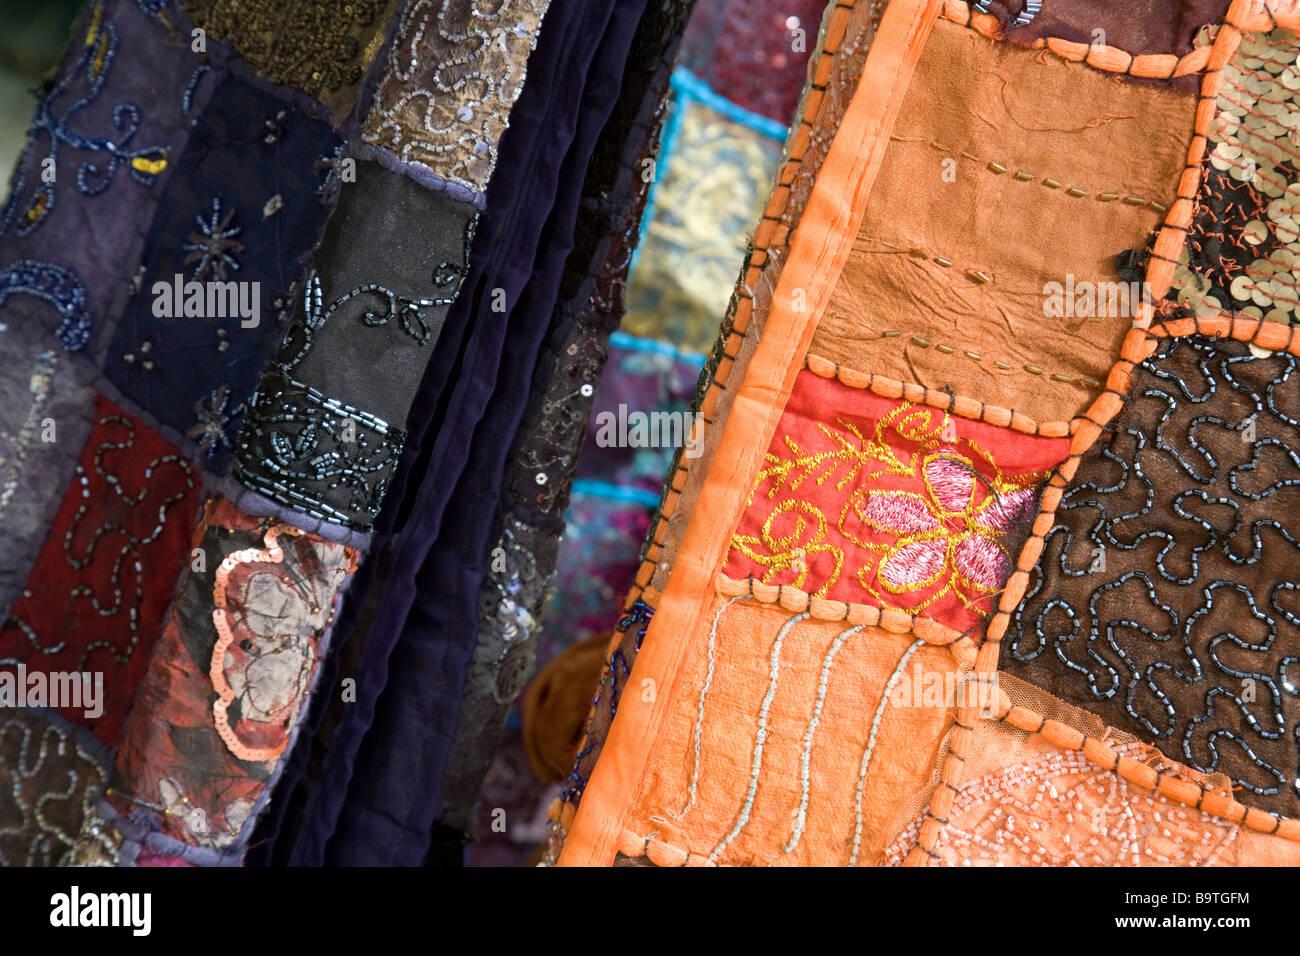 Cerca de coloridos material para la venta, Jordania Imagen De Stock